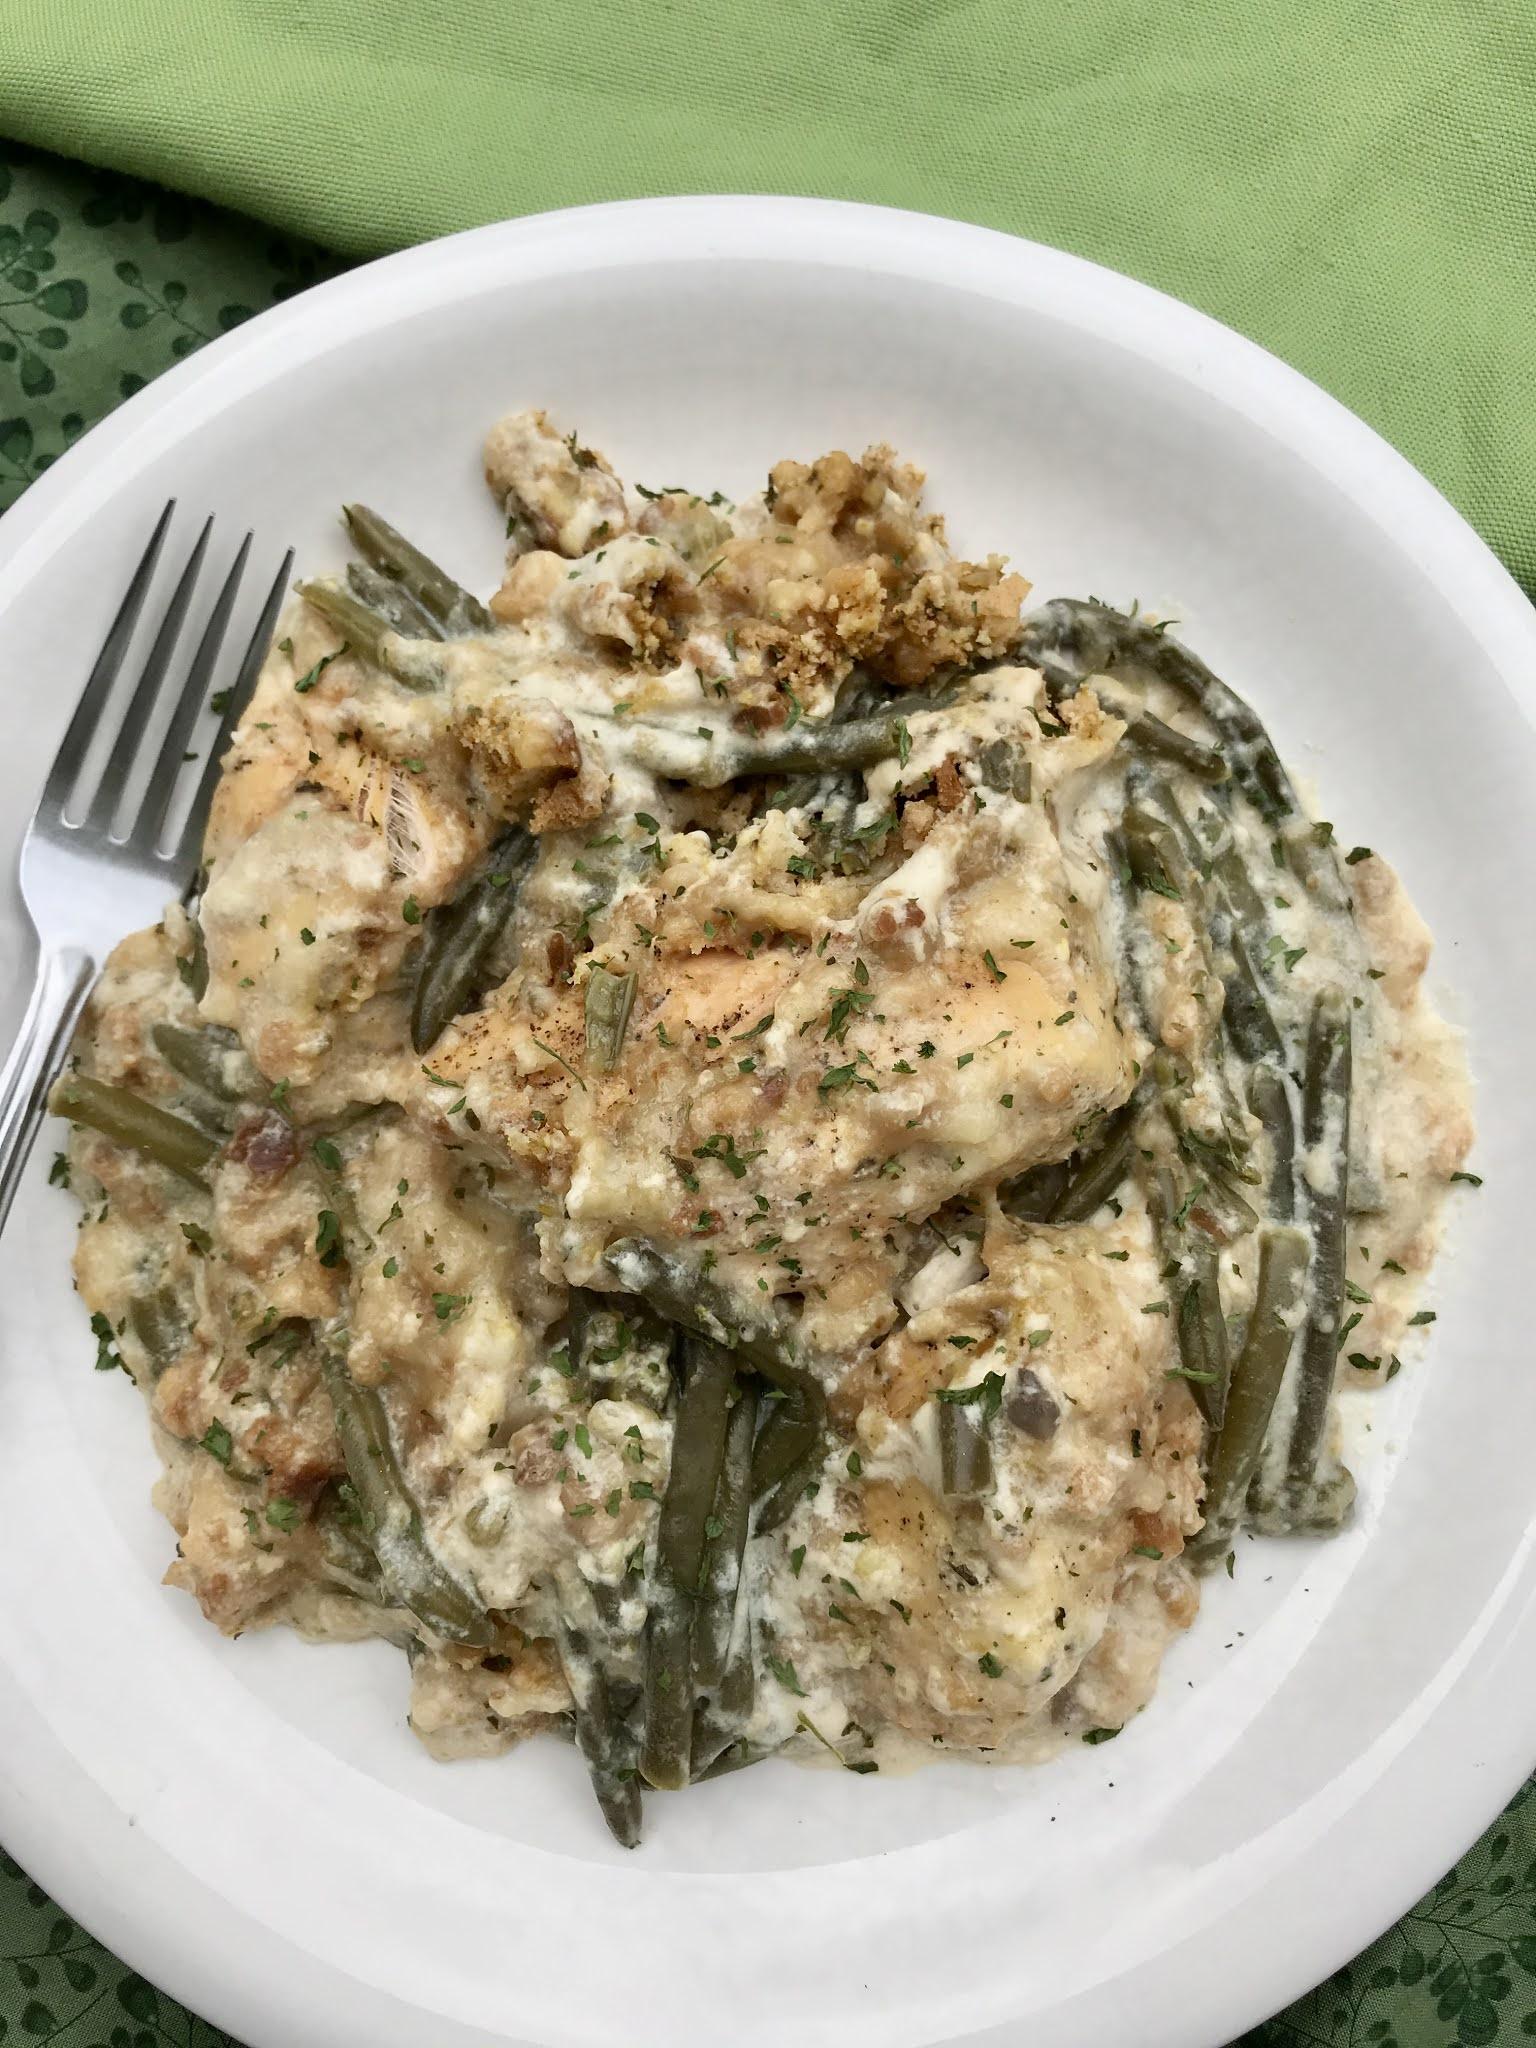 Slow Cooker Chicken, Stuffing, & Green Beans Dinner